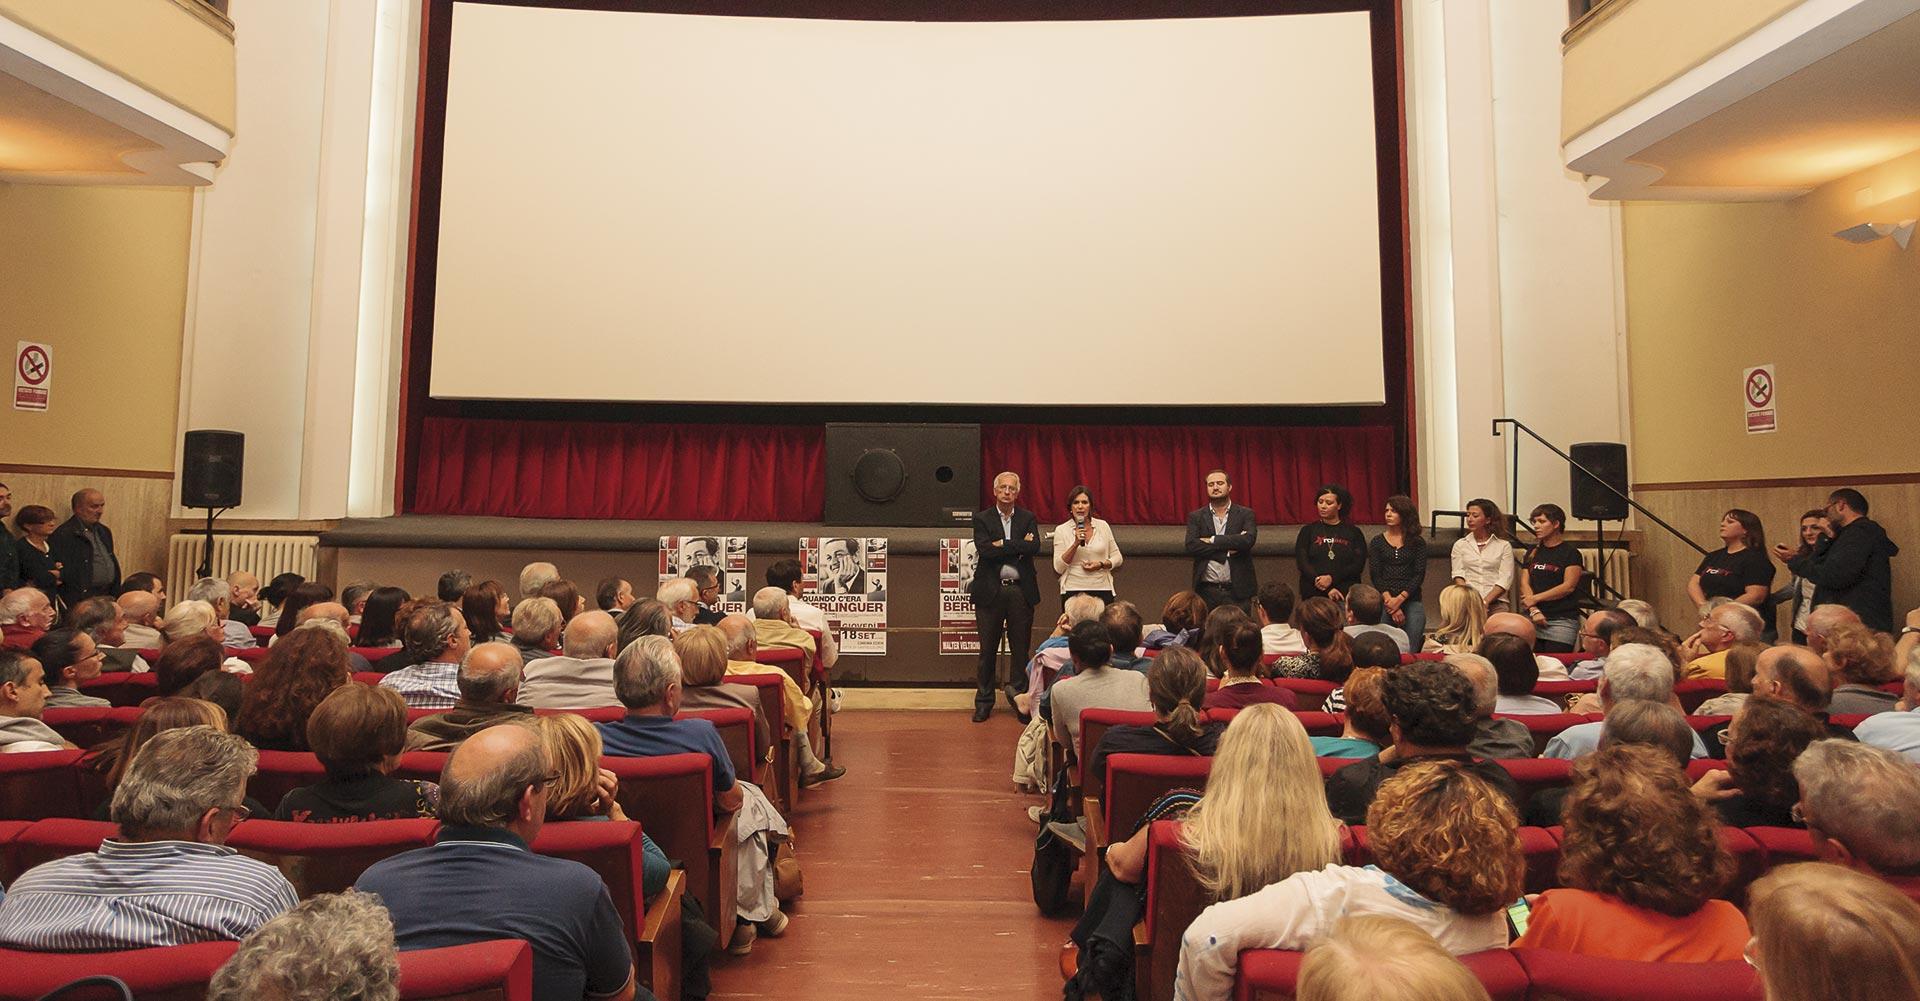 Quando c'era Berlinguer - Cinema Eden Città di Castello